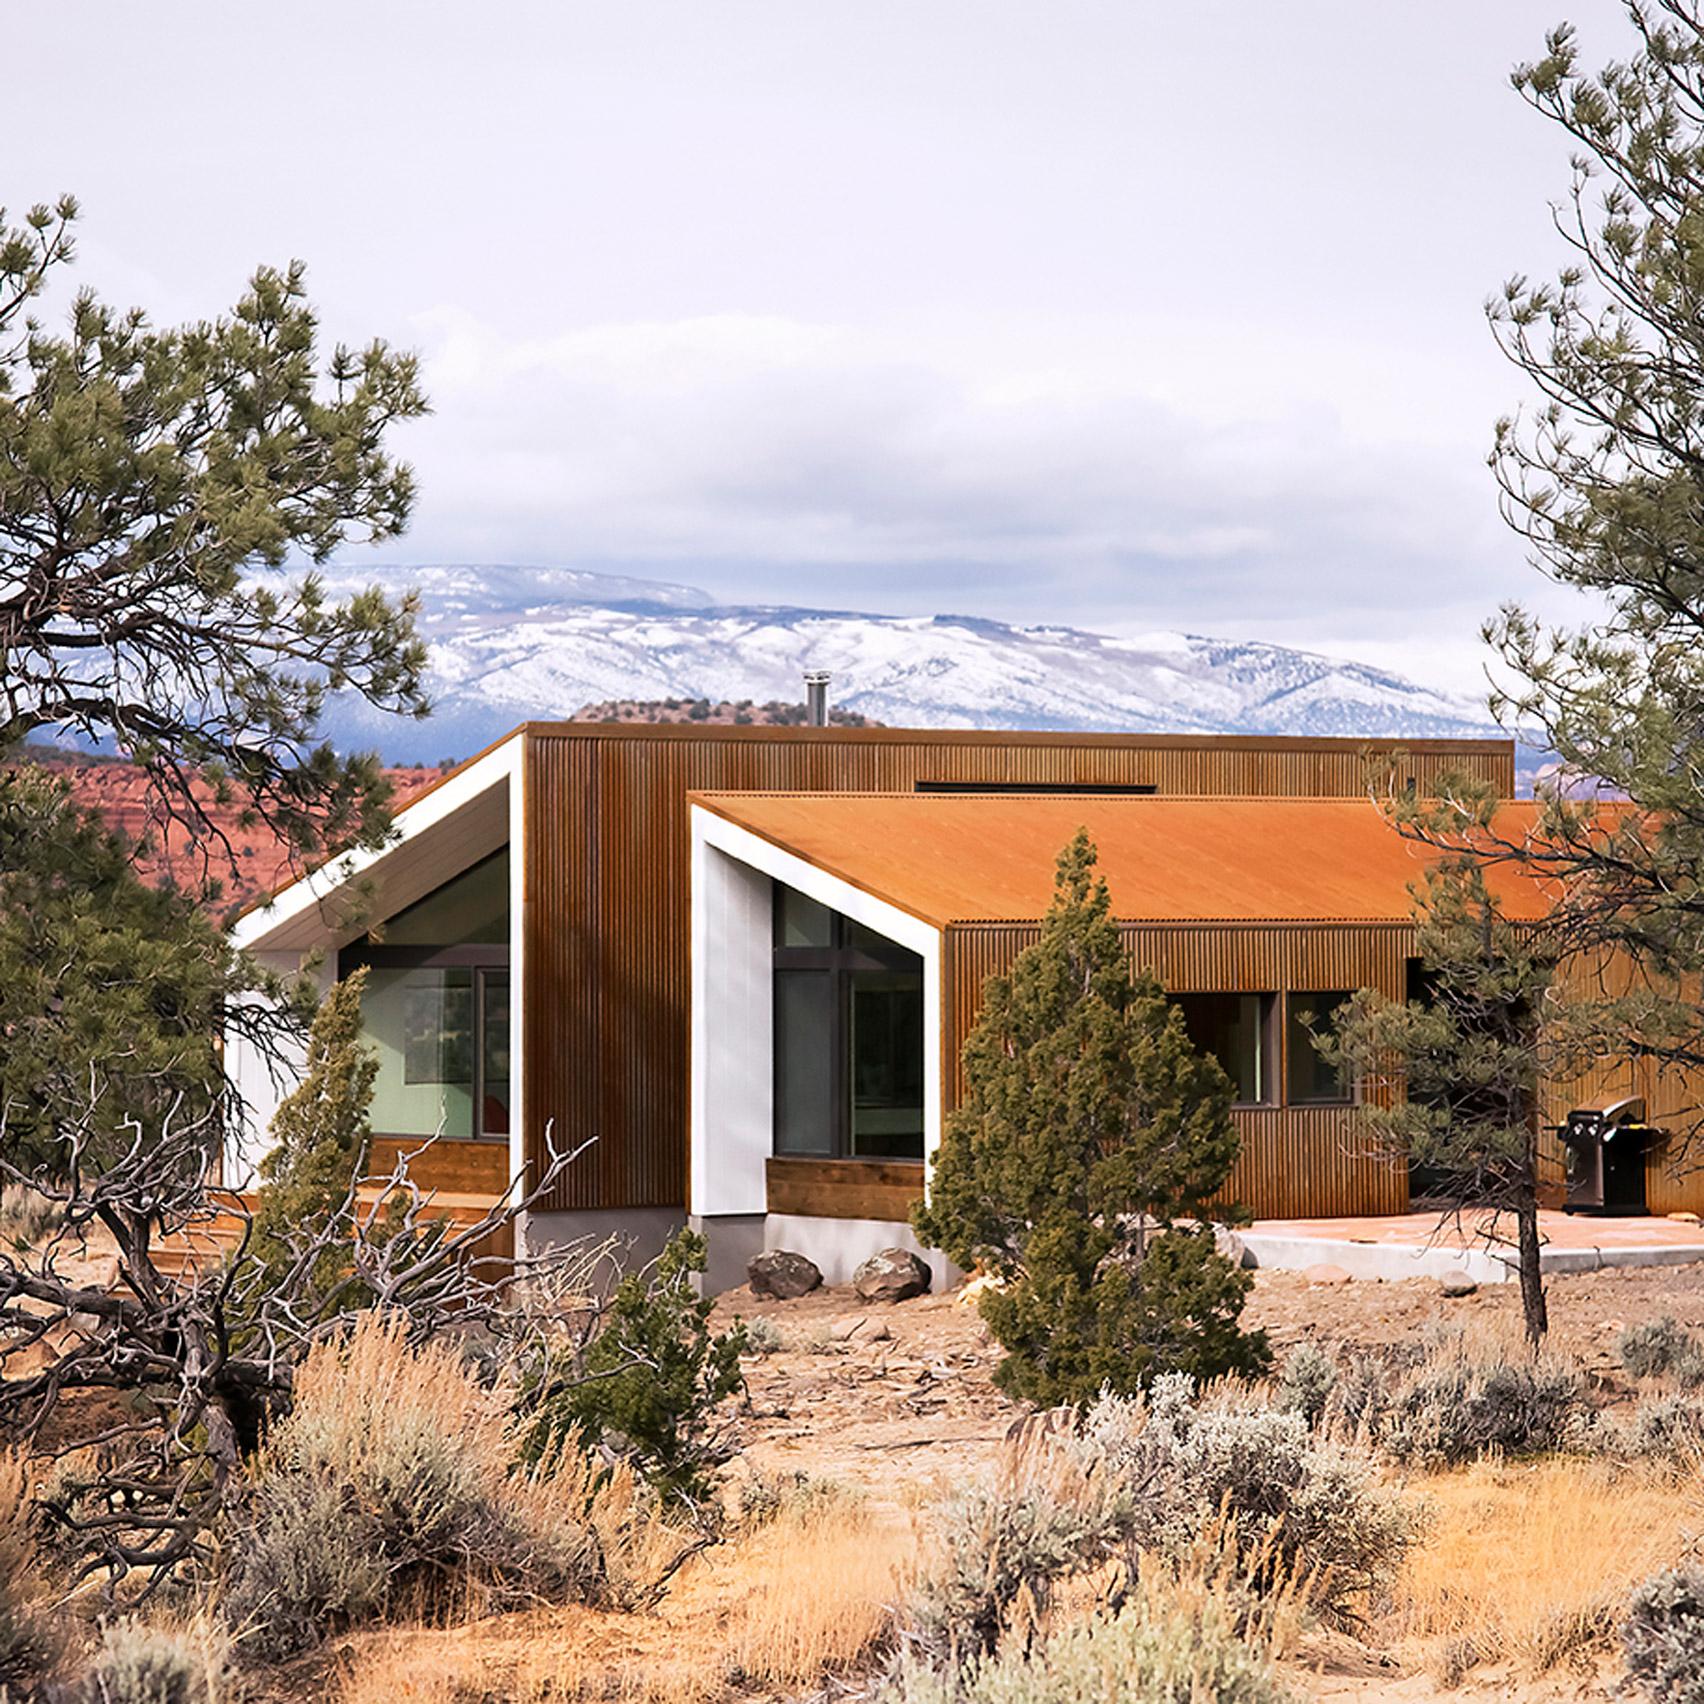 High Desert Dwelling by Imbue